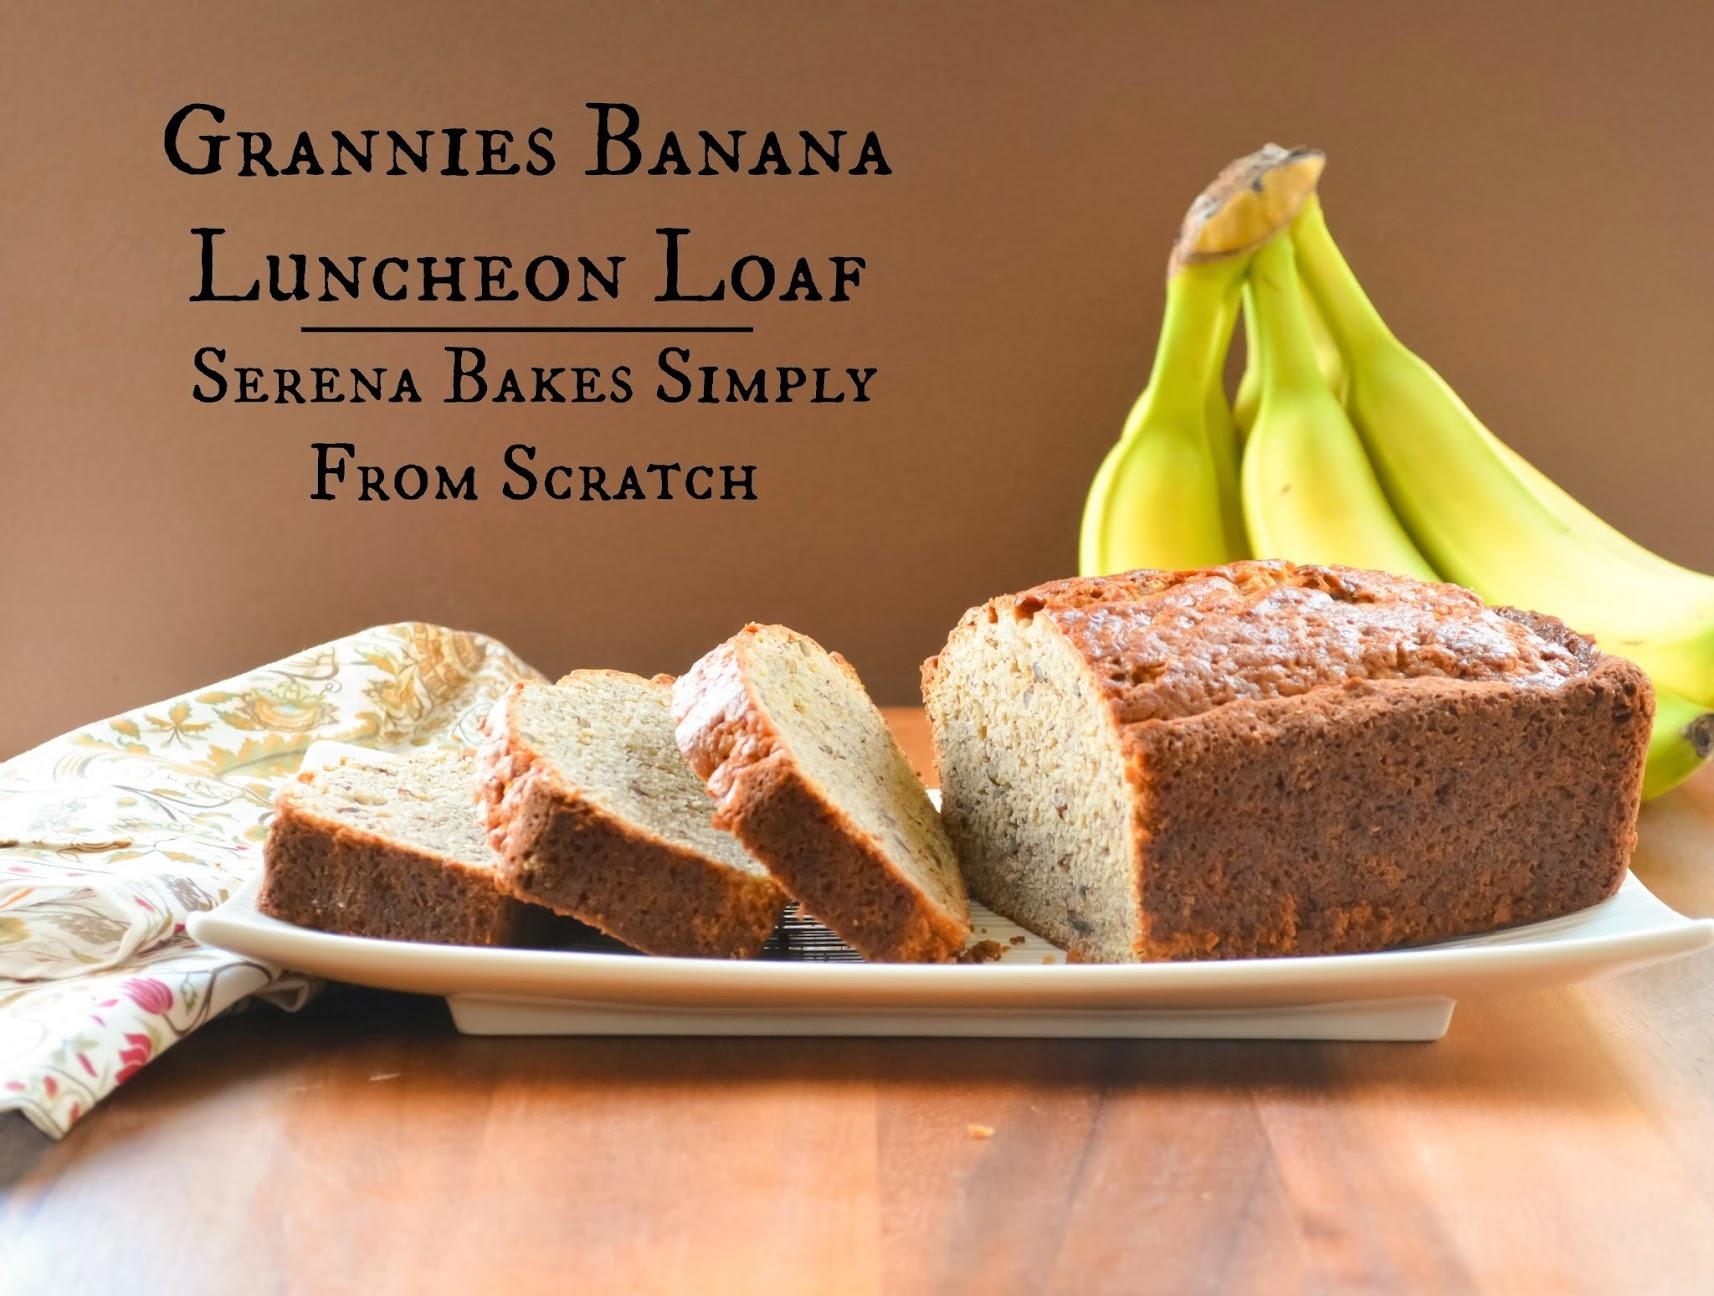 Grannies Banana Luncheon Loaf